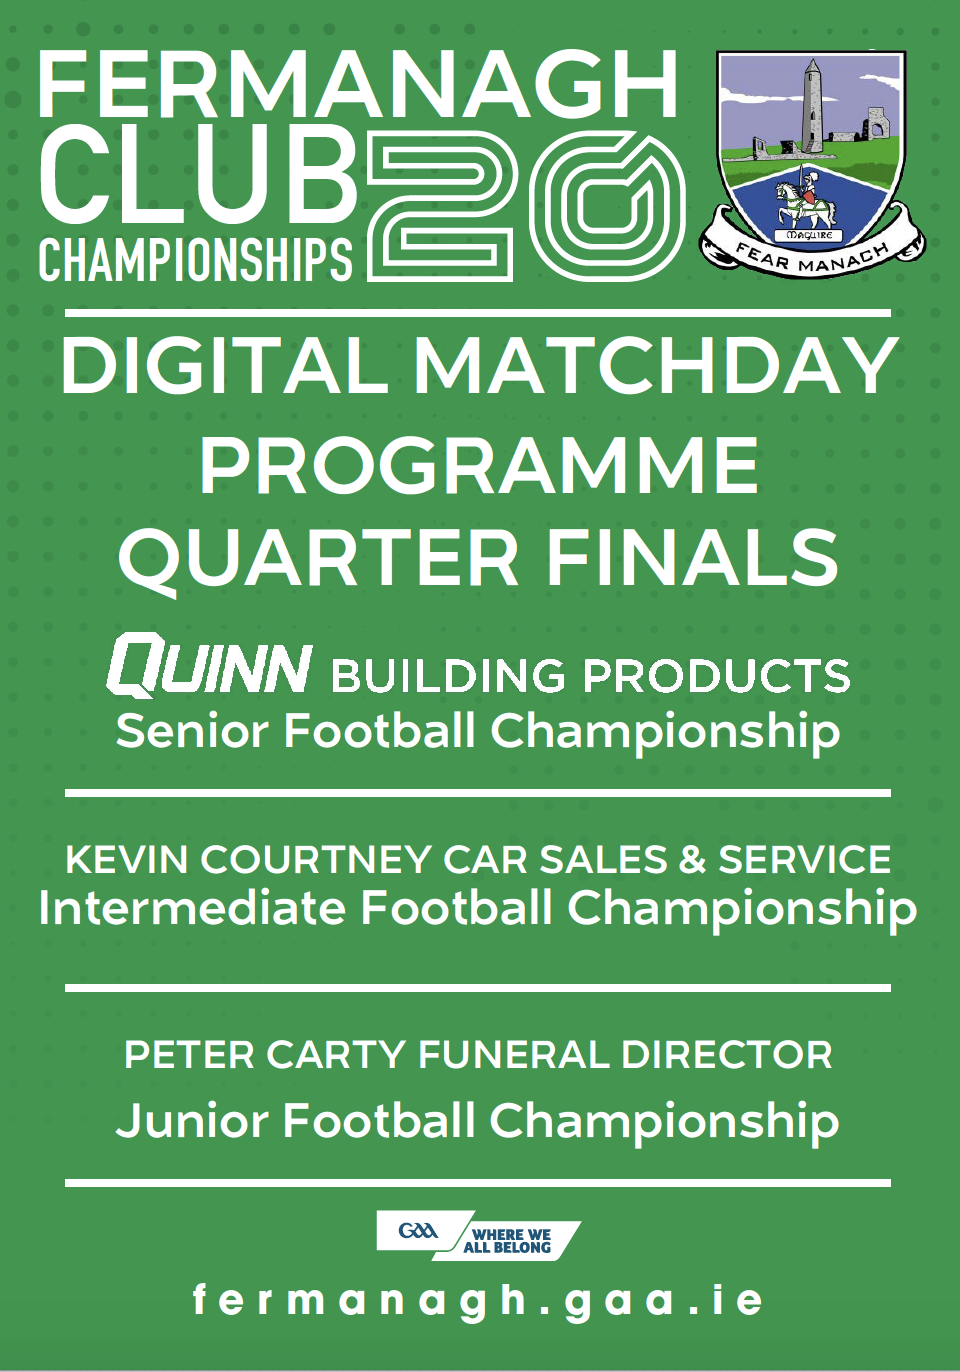 Club Championship Programme